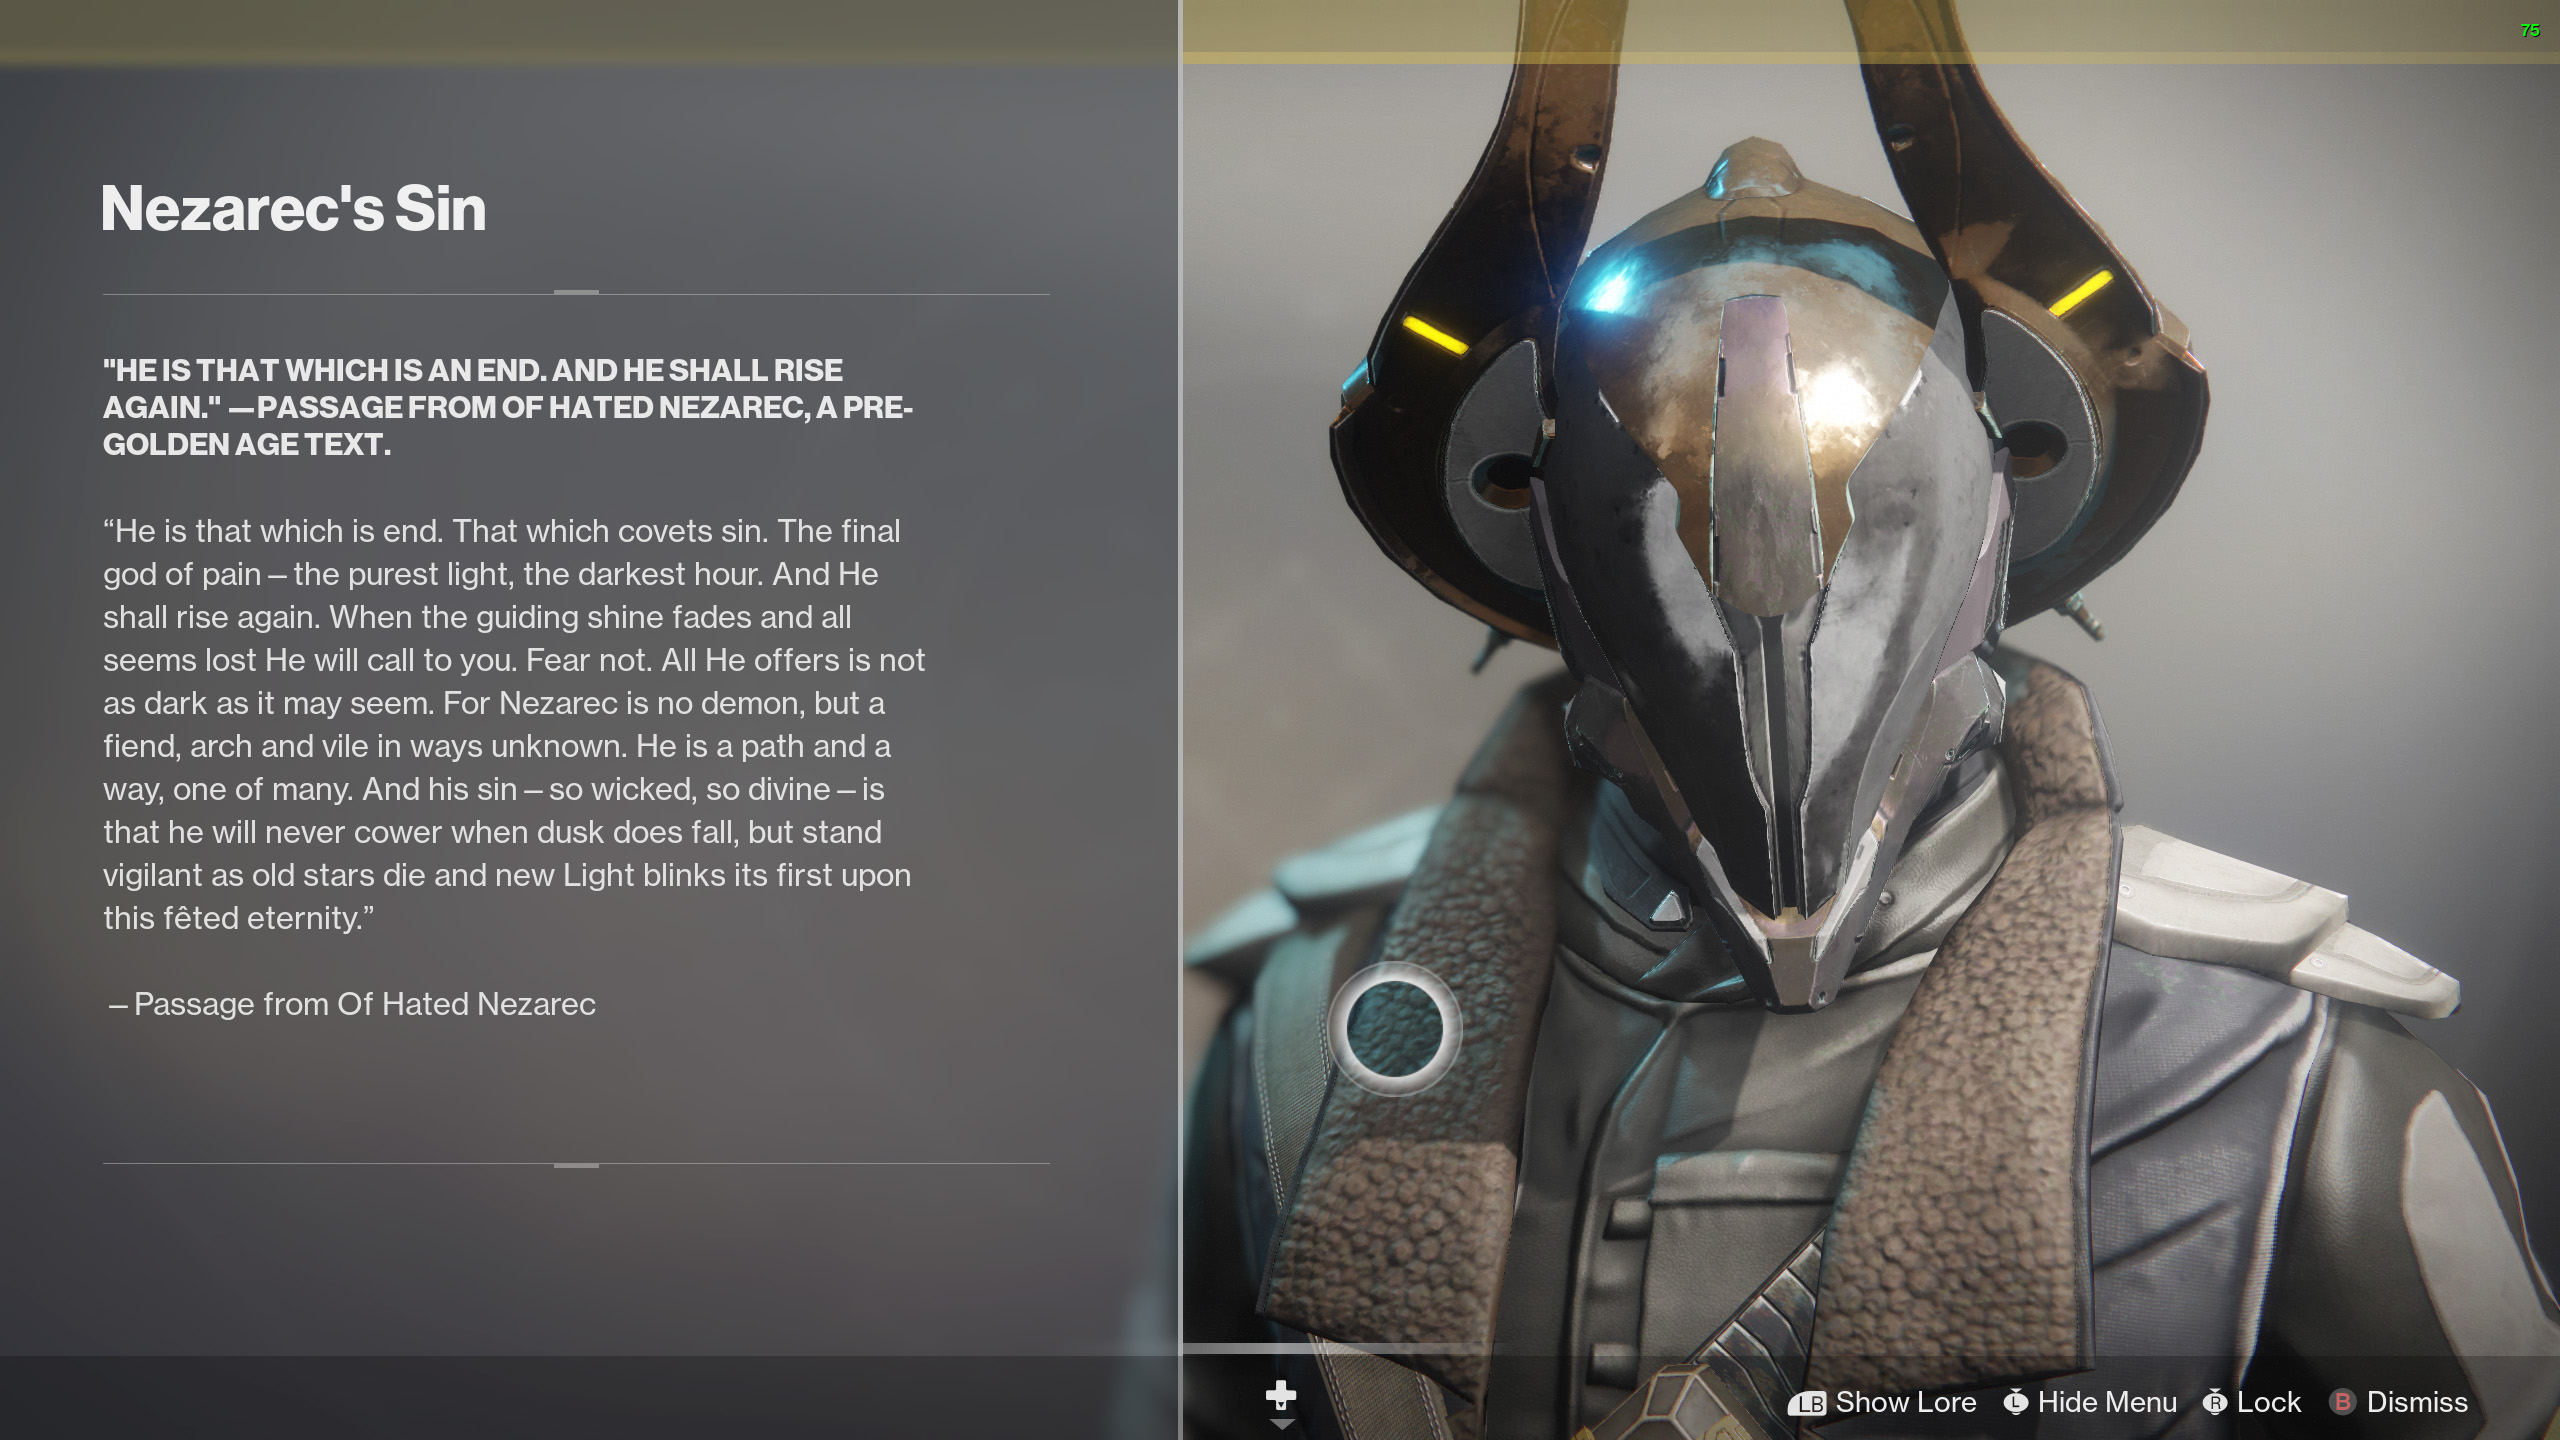 Destiny 2 Nezarec's Sin lore